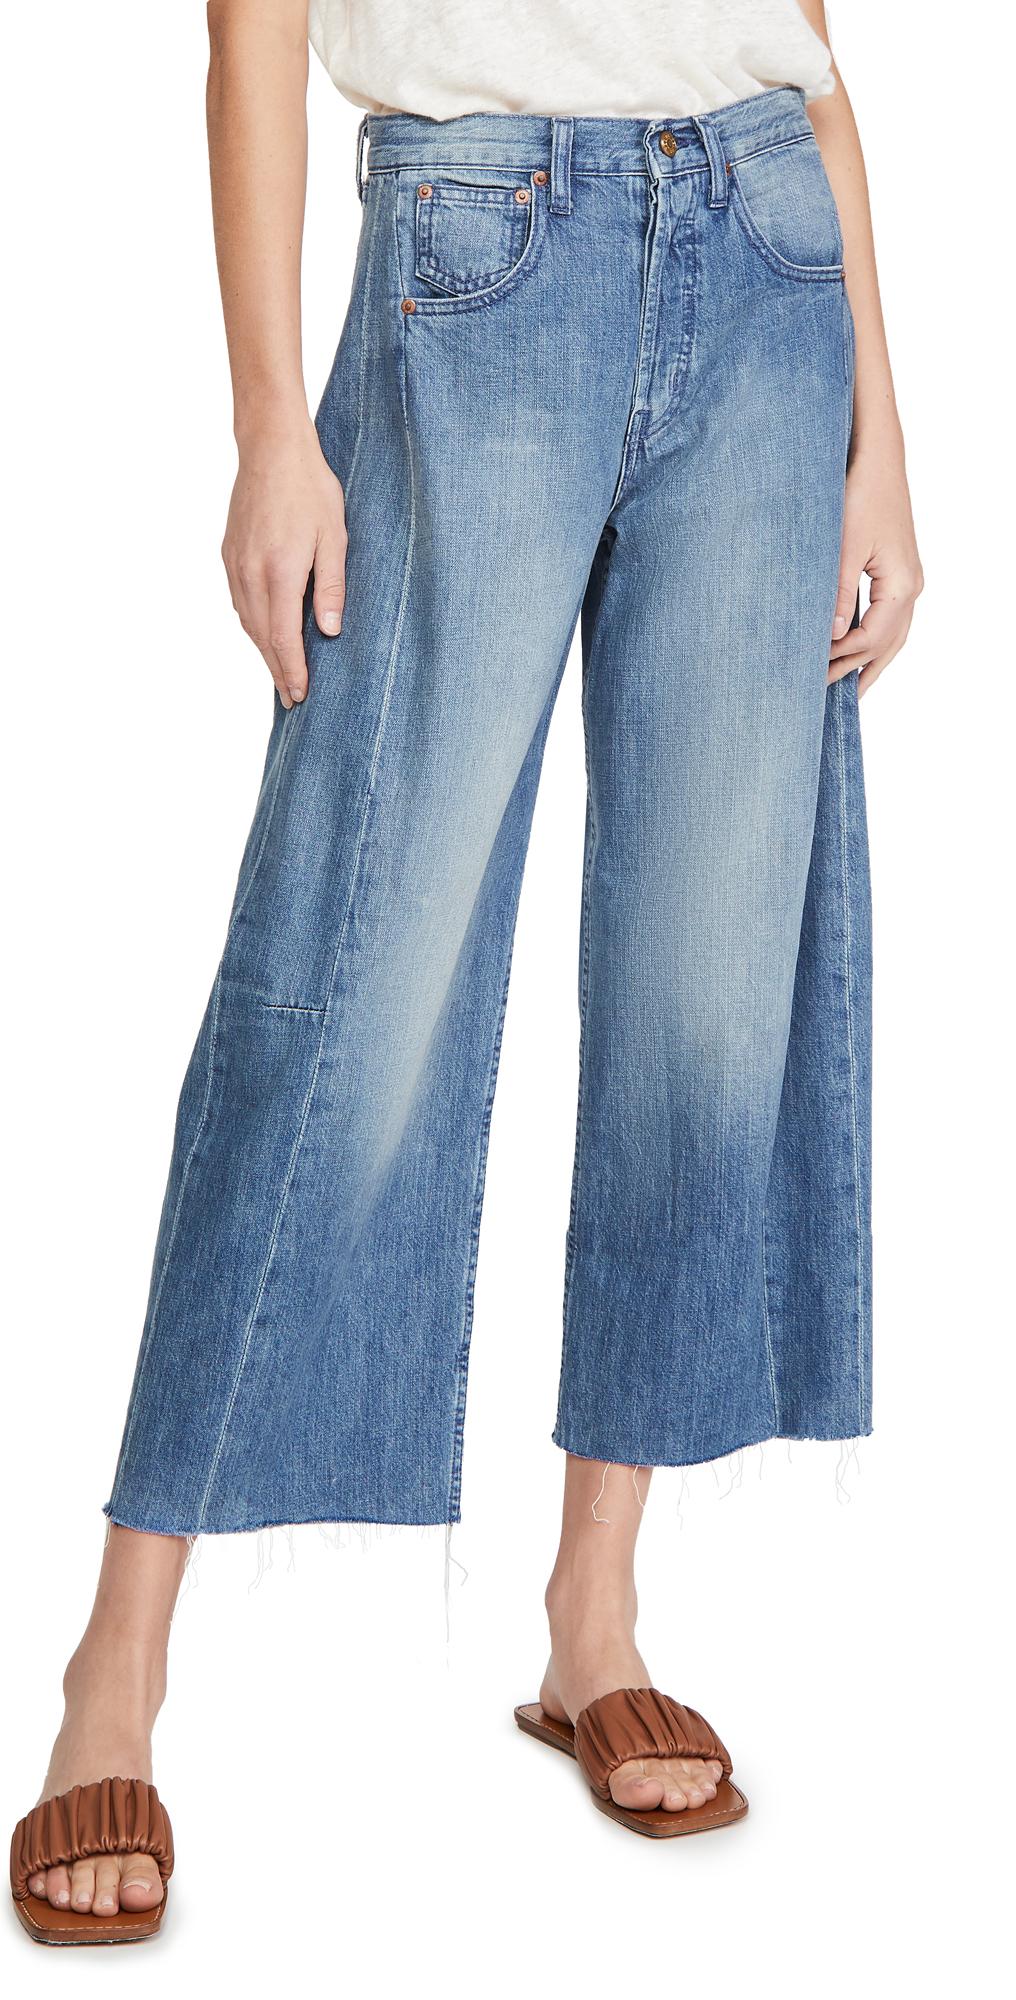 B Sides Plein Lasso Jeans